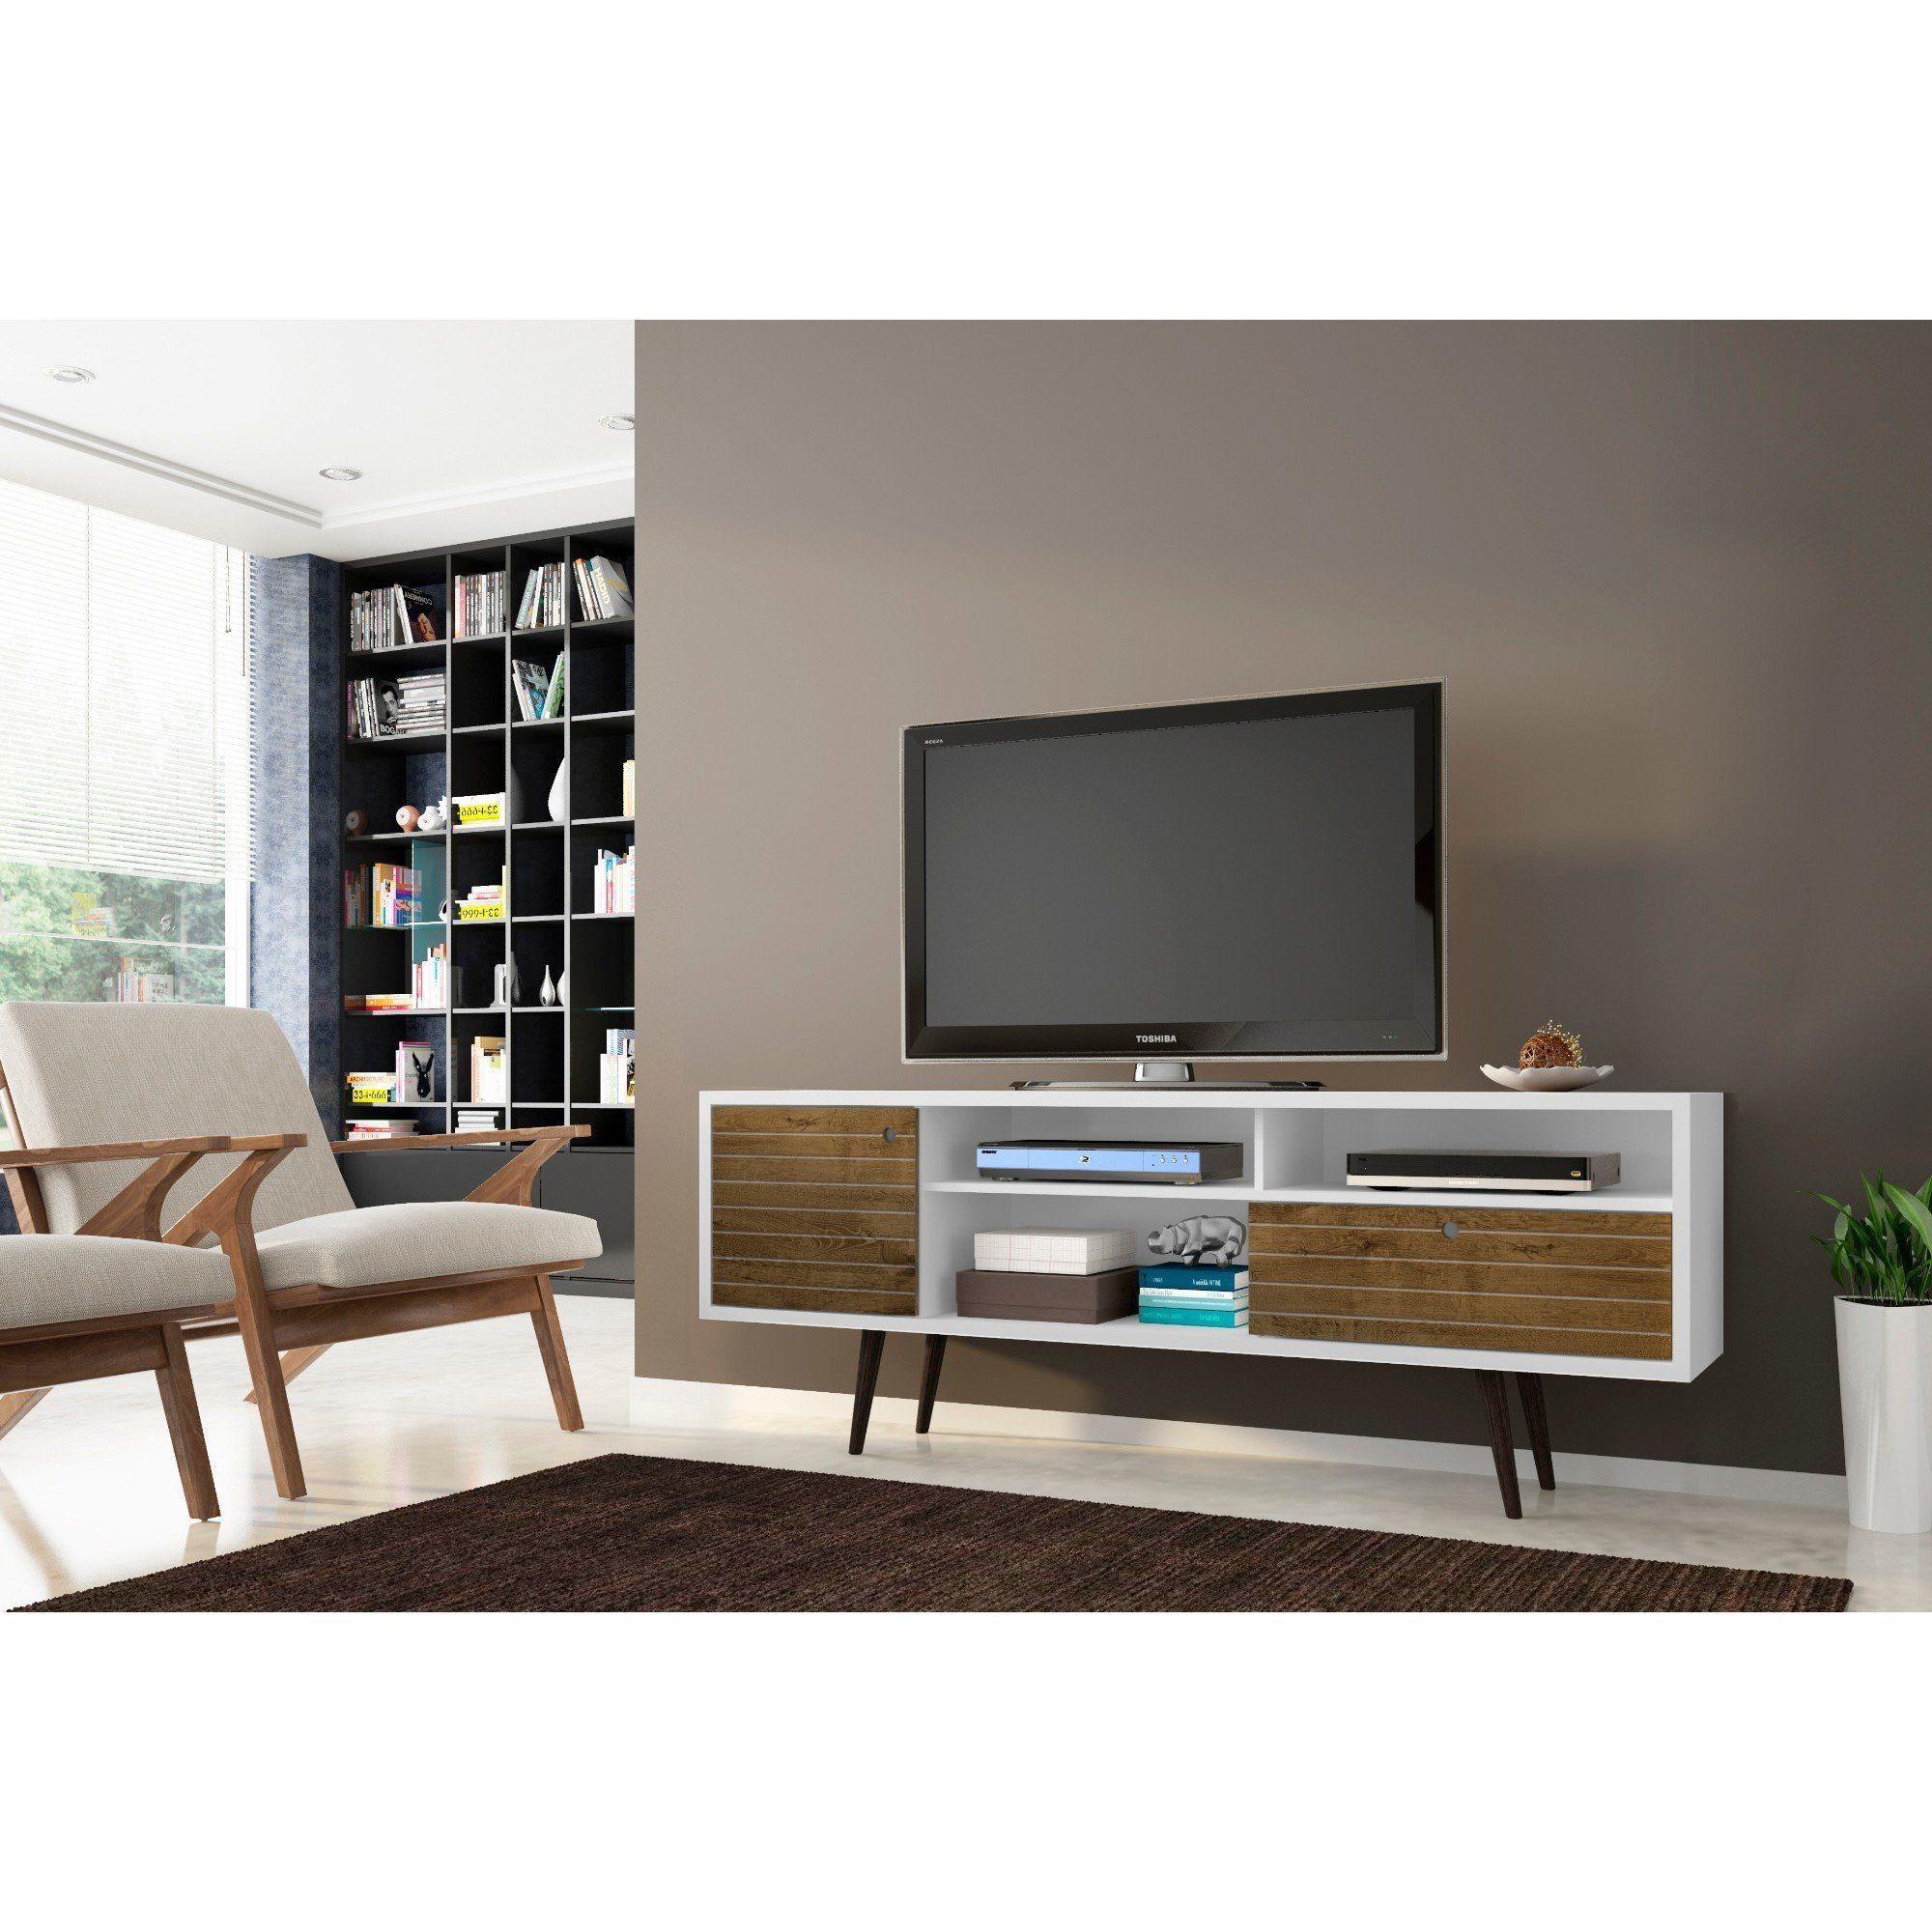 Amal Mid Century Modern Tv Stand Console Table Entertainment Center Scandinav Mid Century Modern Tv Stand Modern Entertainment Center Midcentury Tv Stand